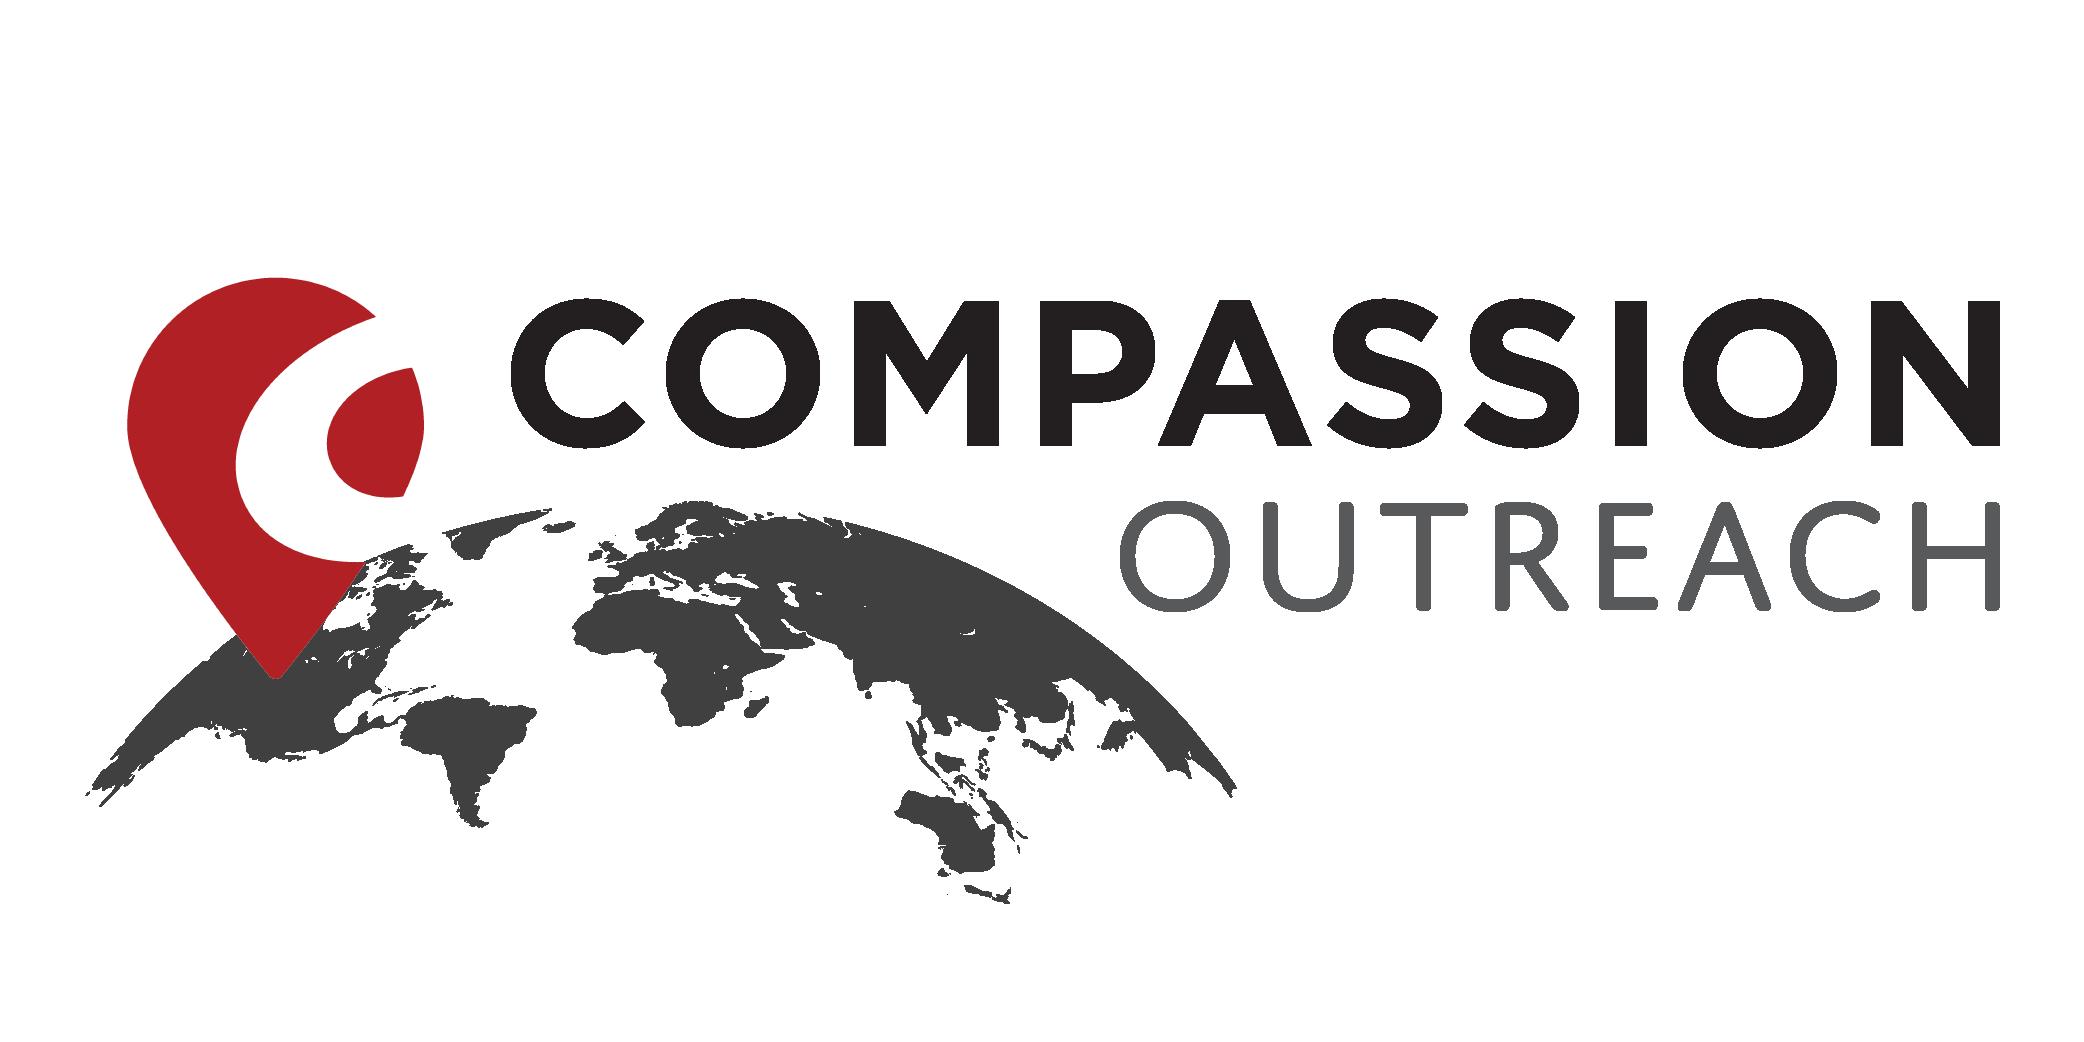 Compassion Outreach